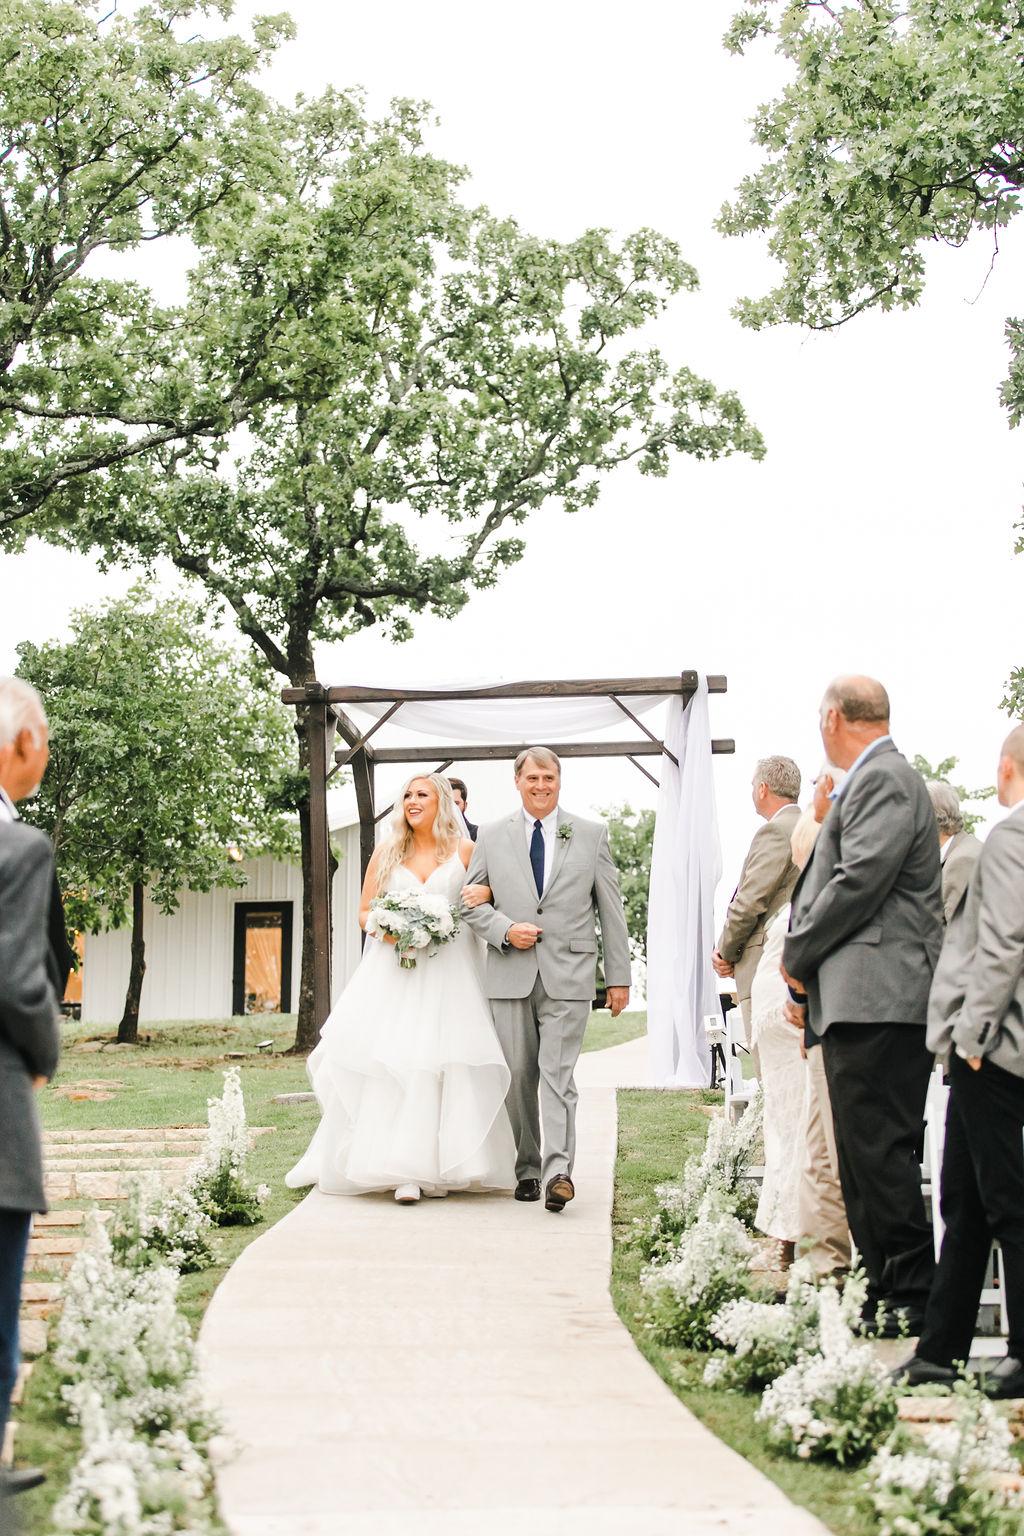 Dream Point Ranch Tulsa's White Barn Wedding Venue 68.jpg